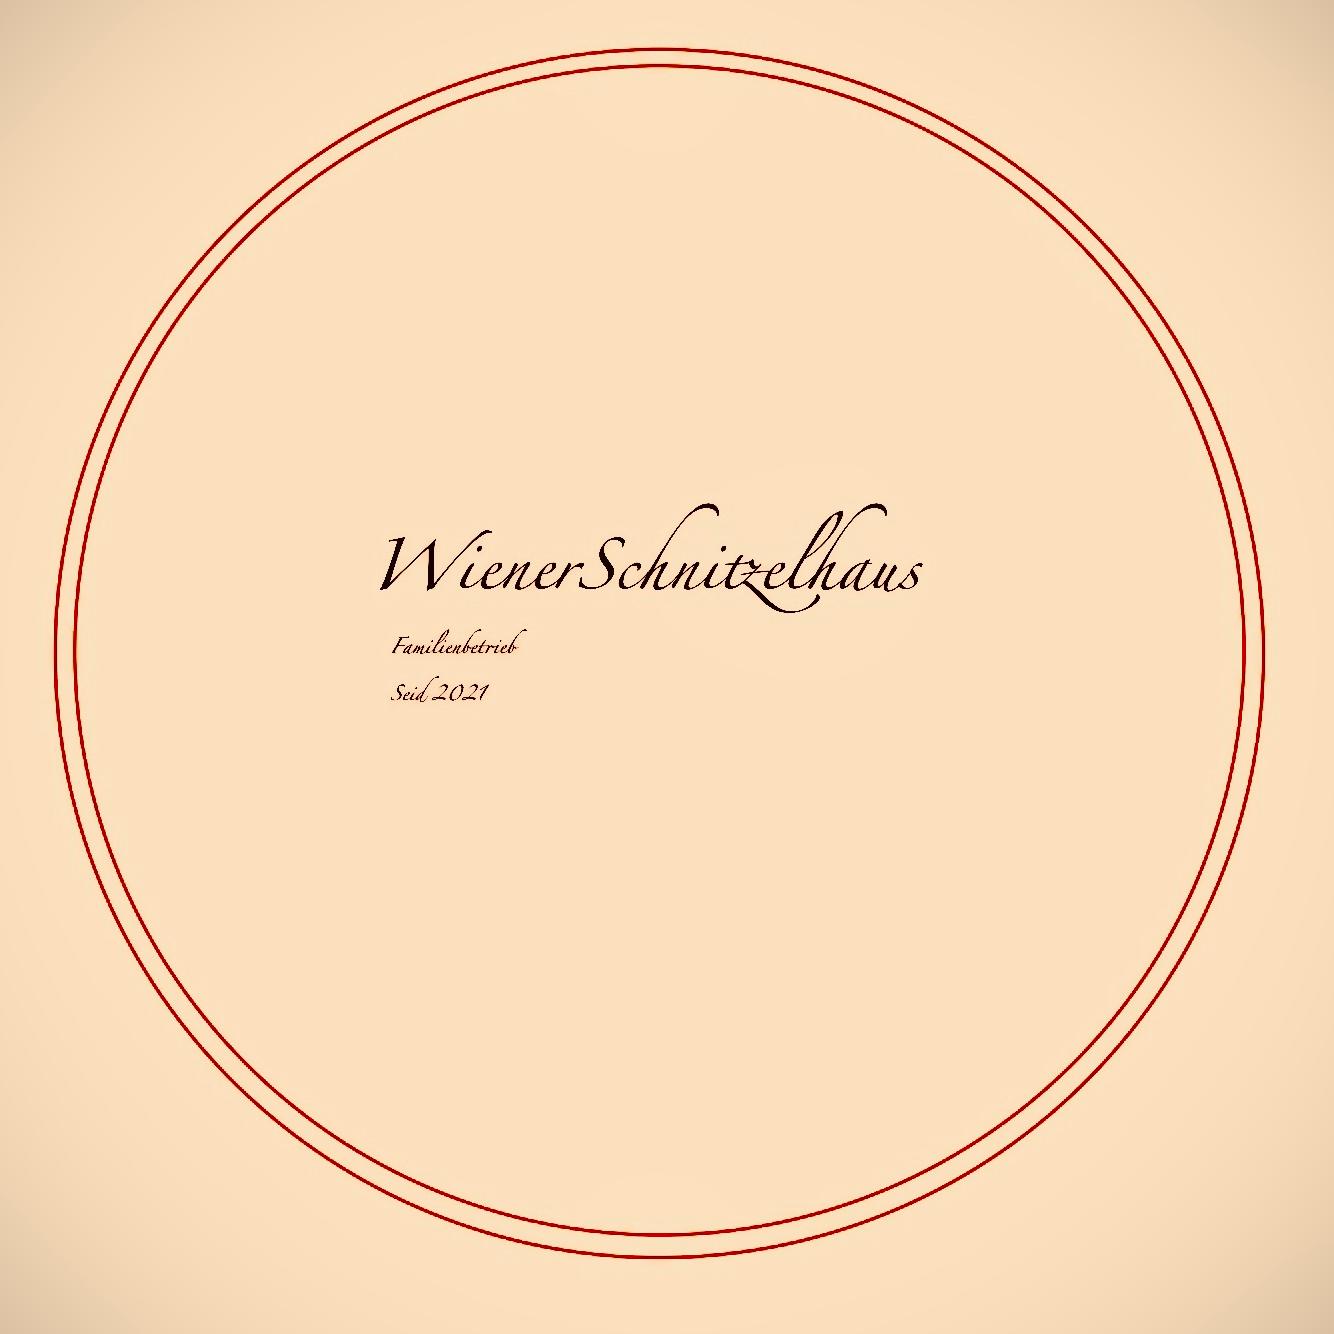 Wiener Schnitzelhaus